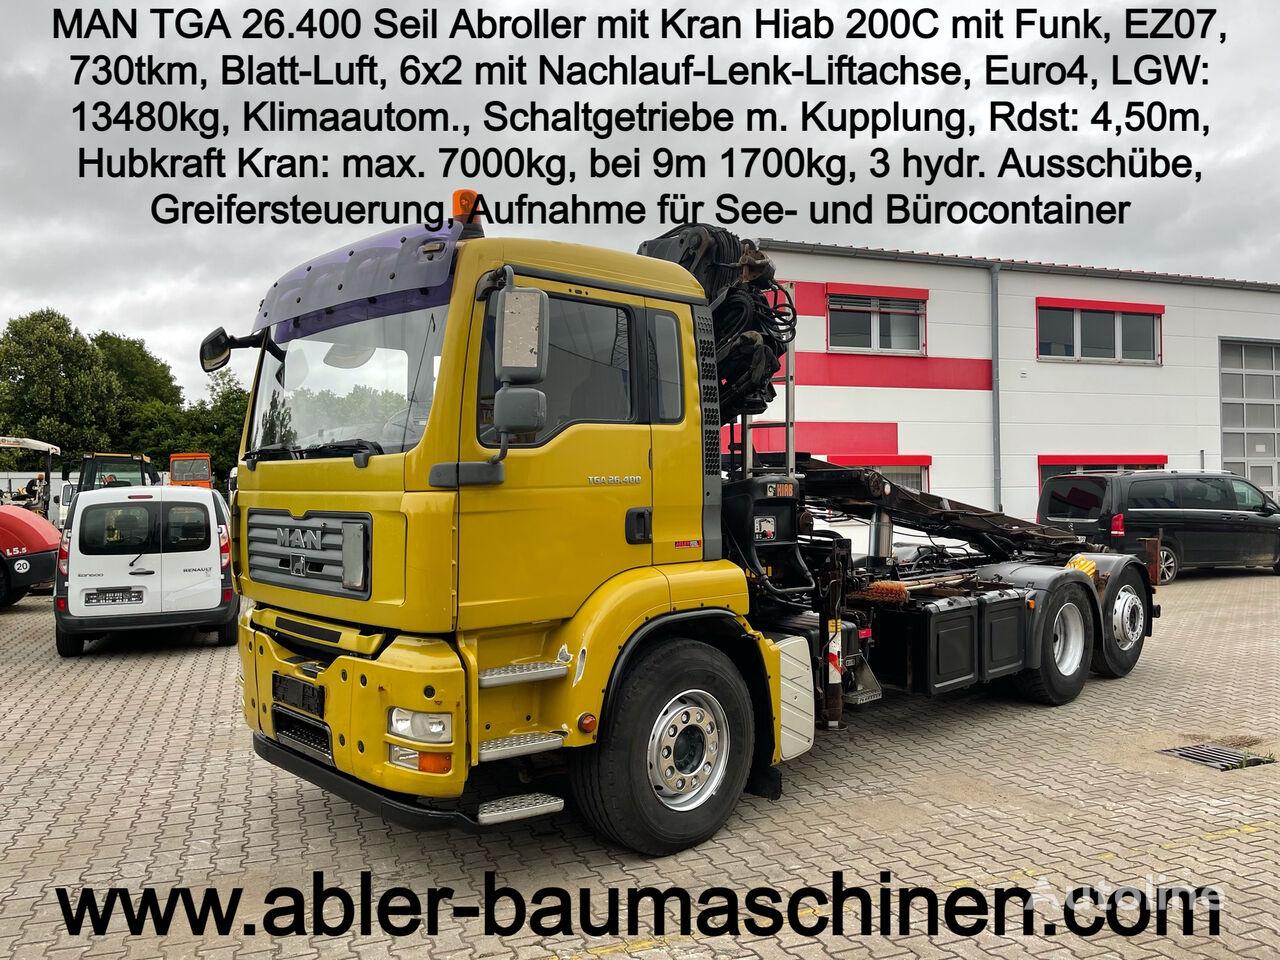 MAN TGA 26.400 Seilabroller mit Kran Hiab cable system truck